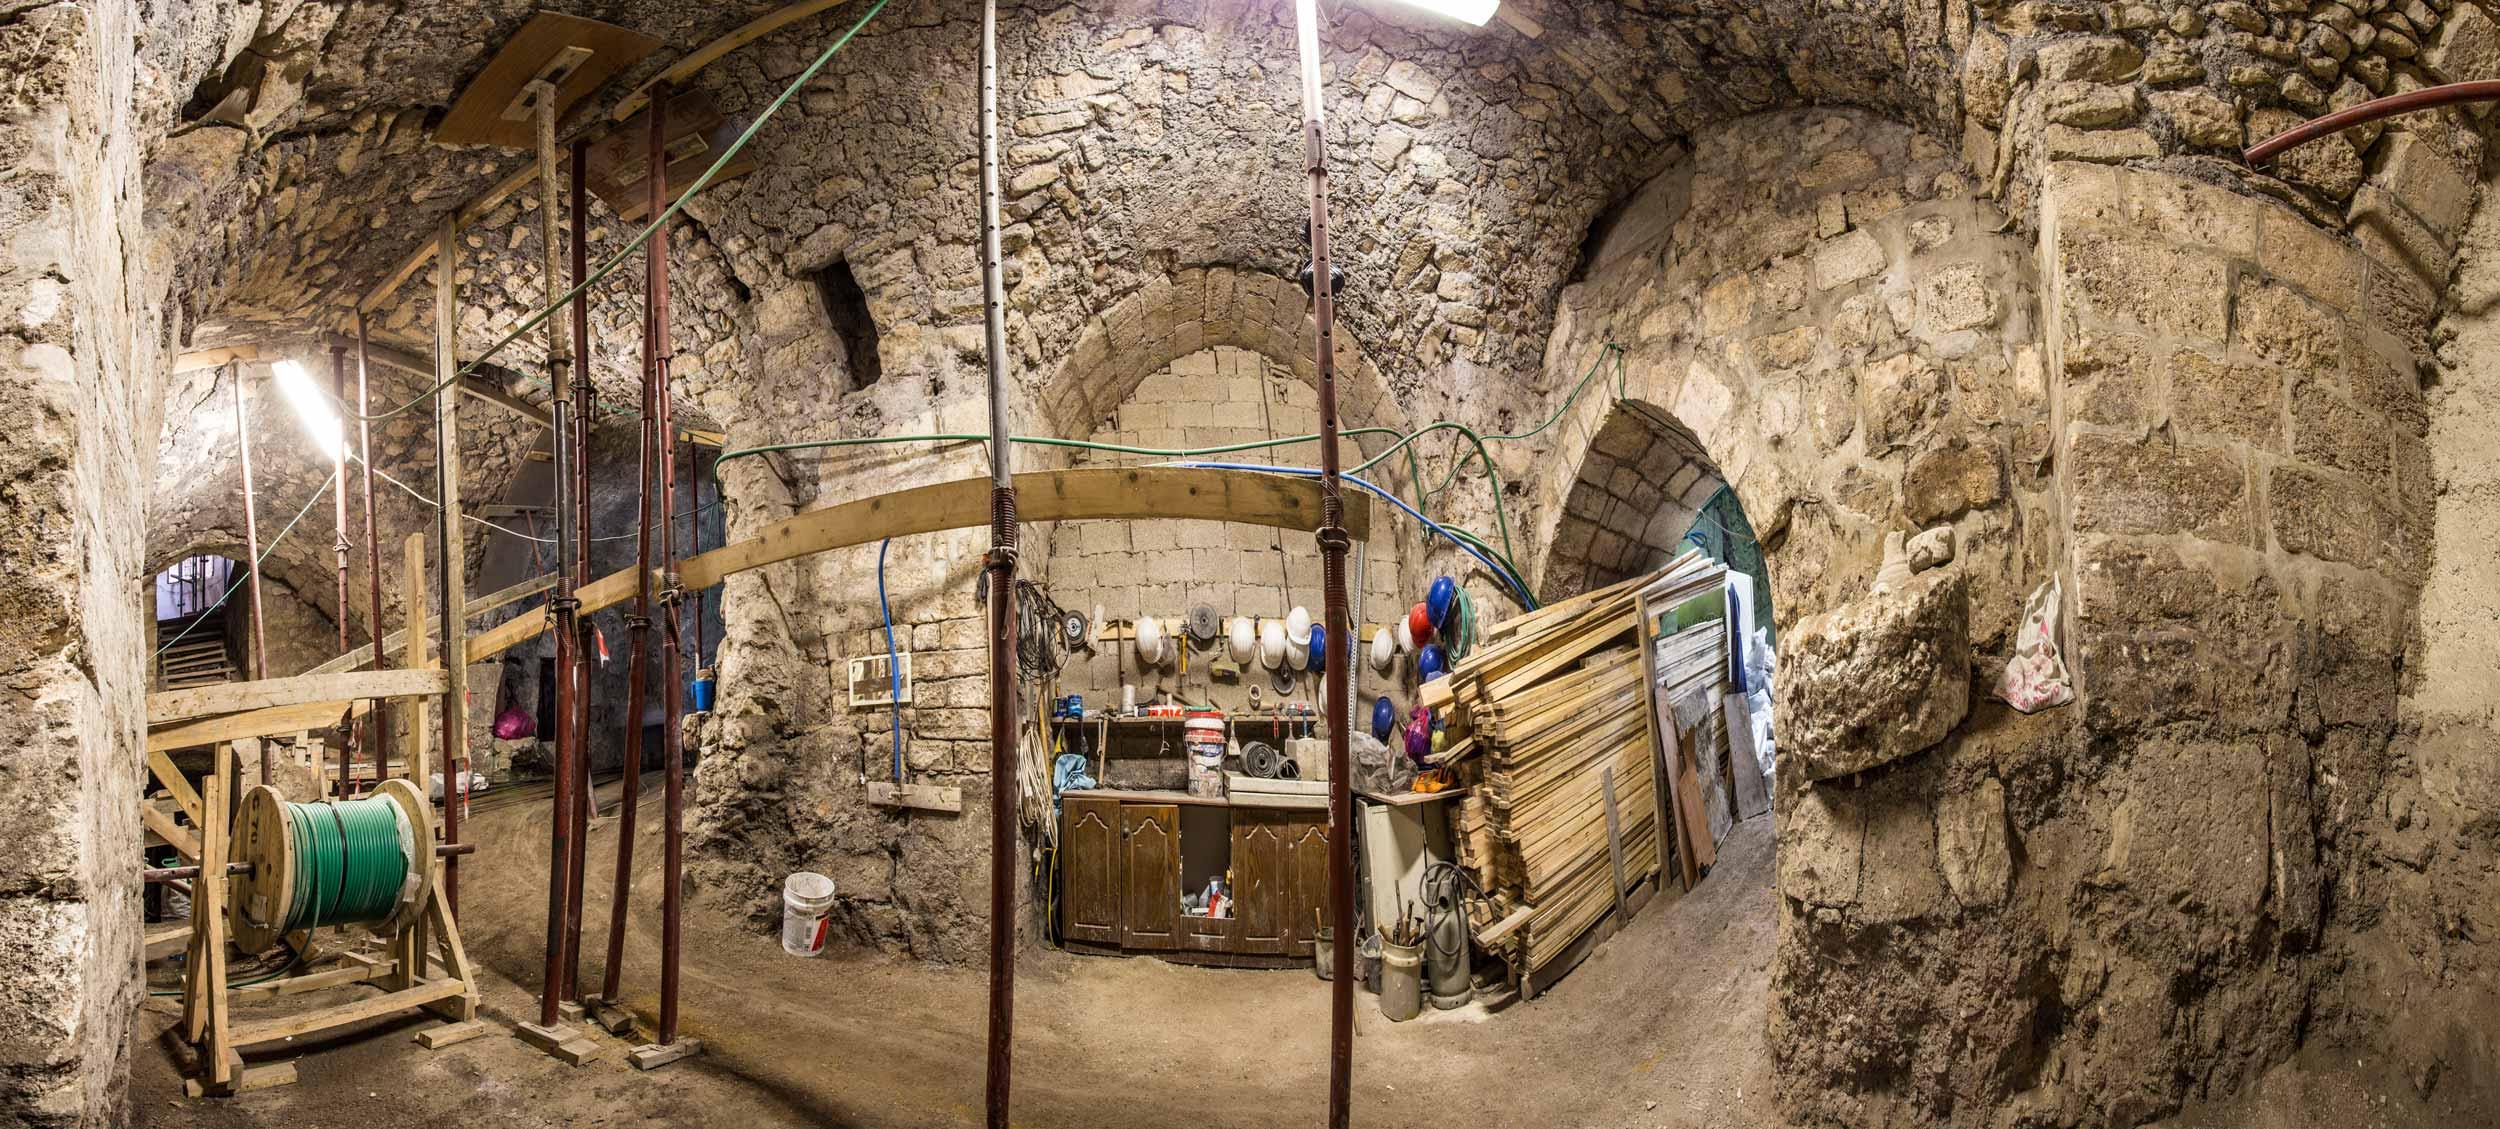 Dar al-Consul Main Hall renovations, Old City, Jerusalem